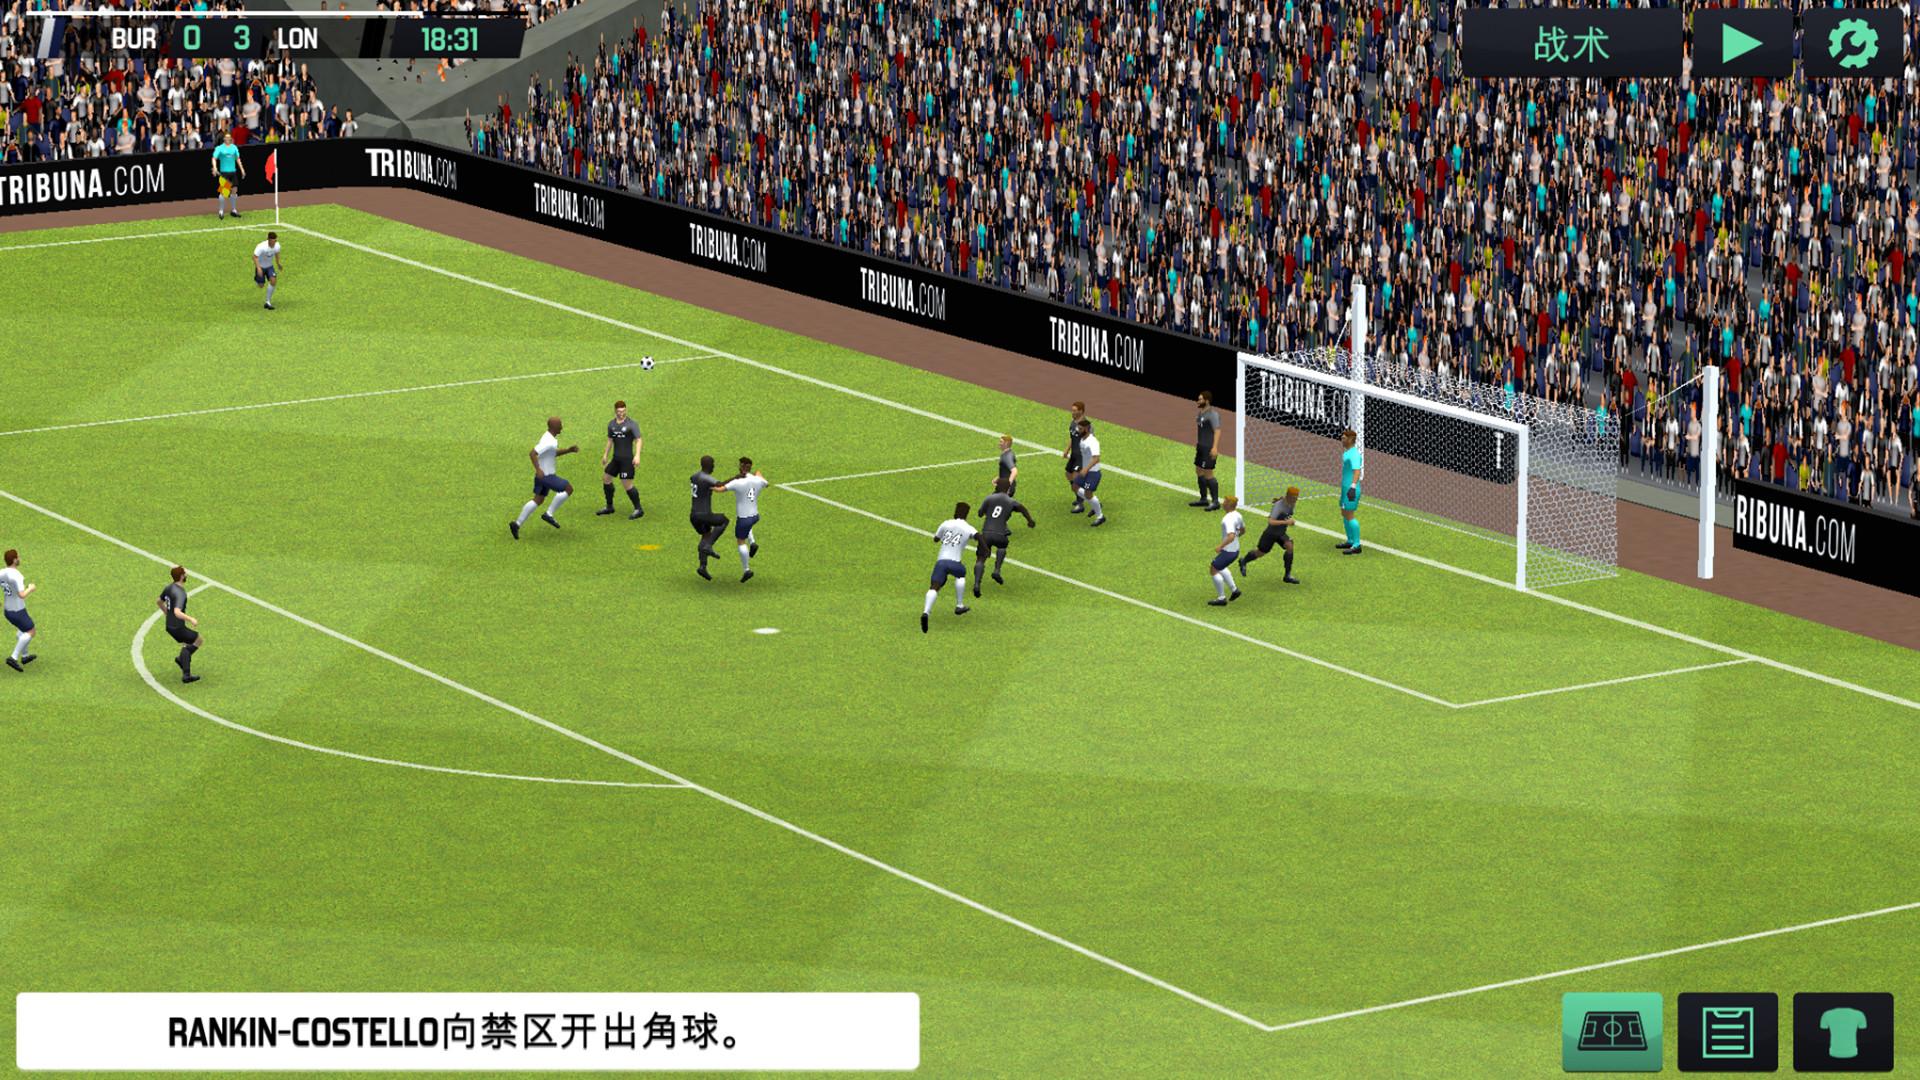 Steam 上的 Soccer Manager 2020